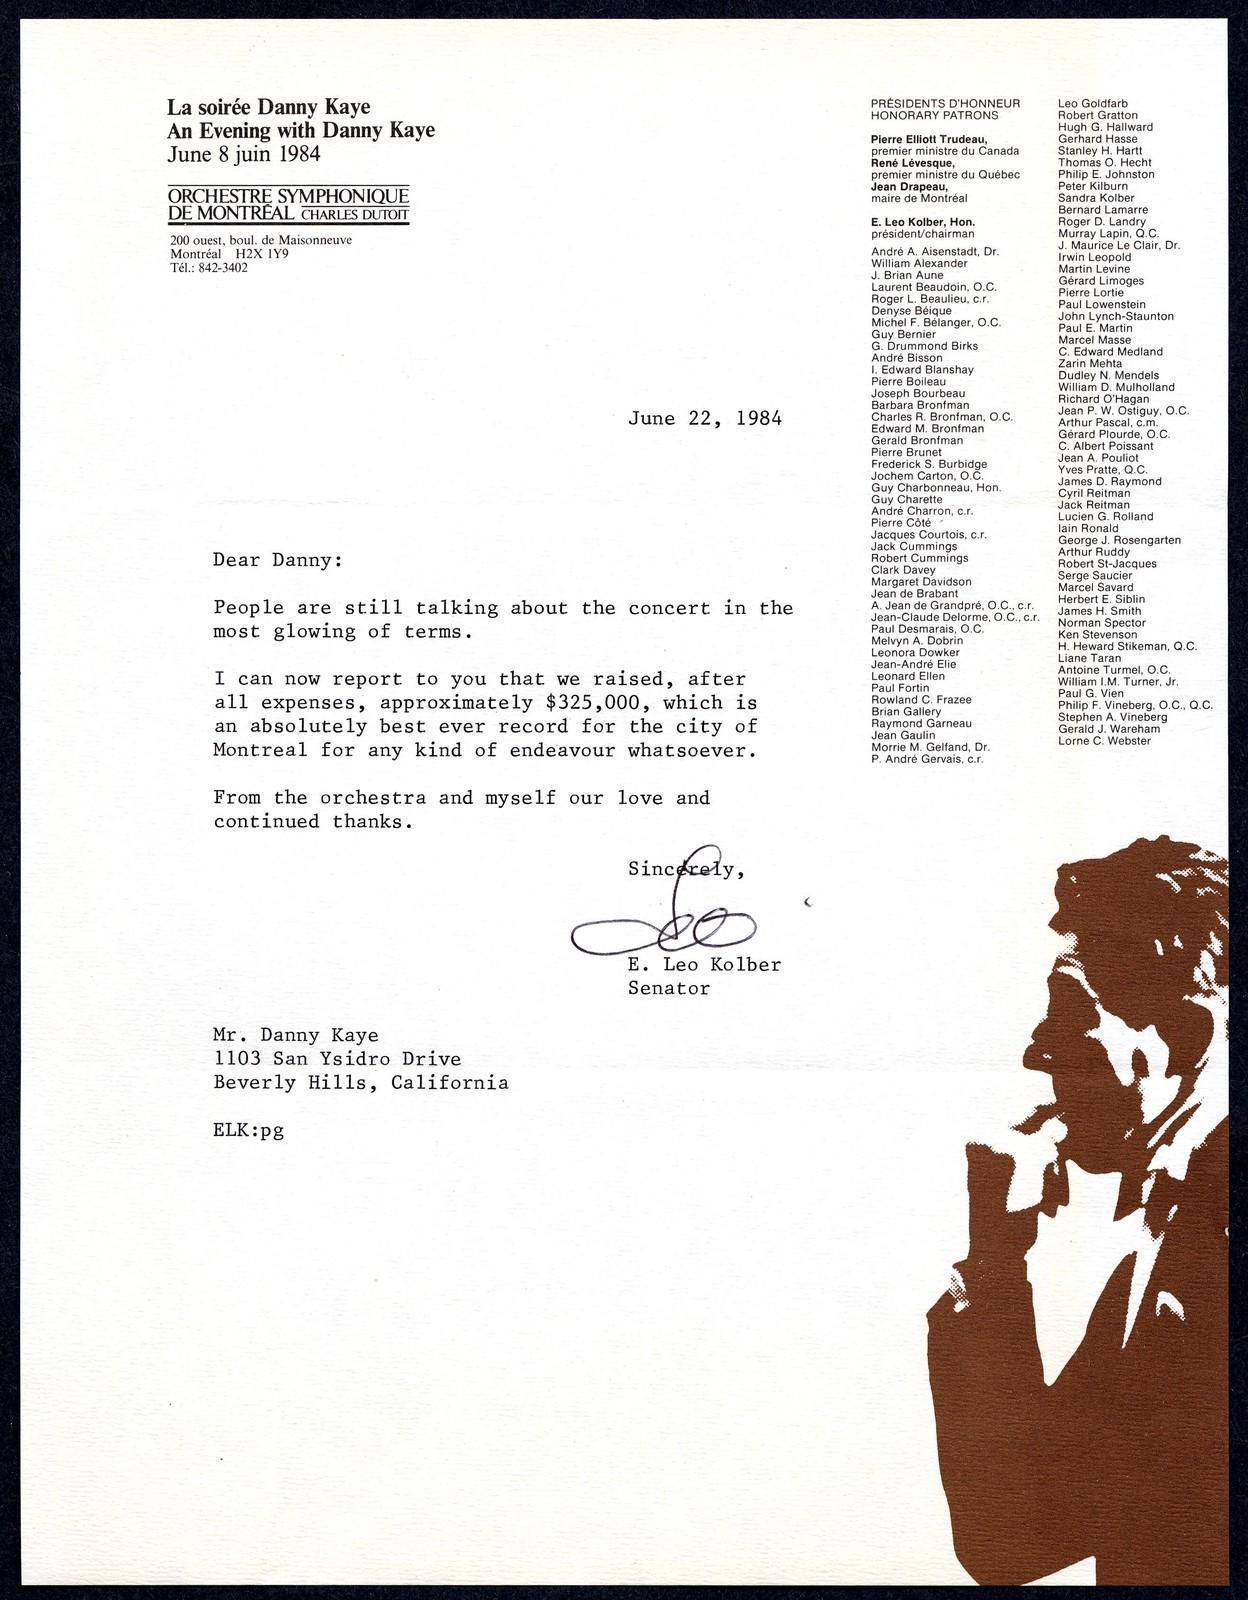 [ Senator E. Leo Kolber, to Danny Kaye, June 22, 1984]